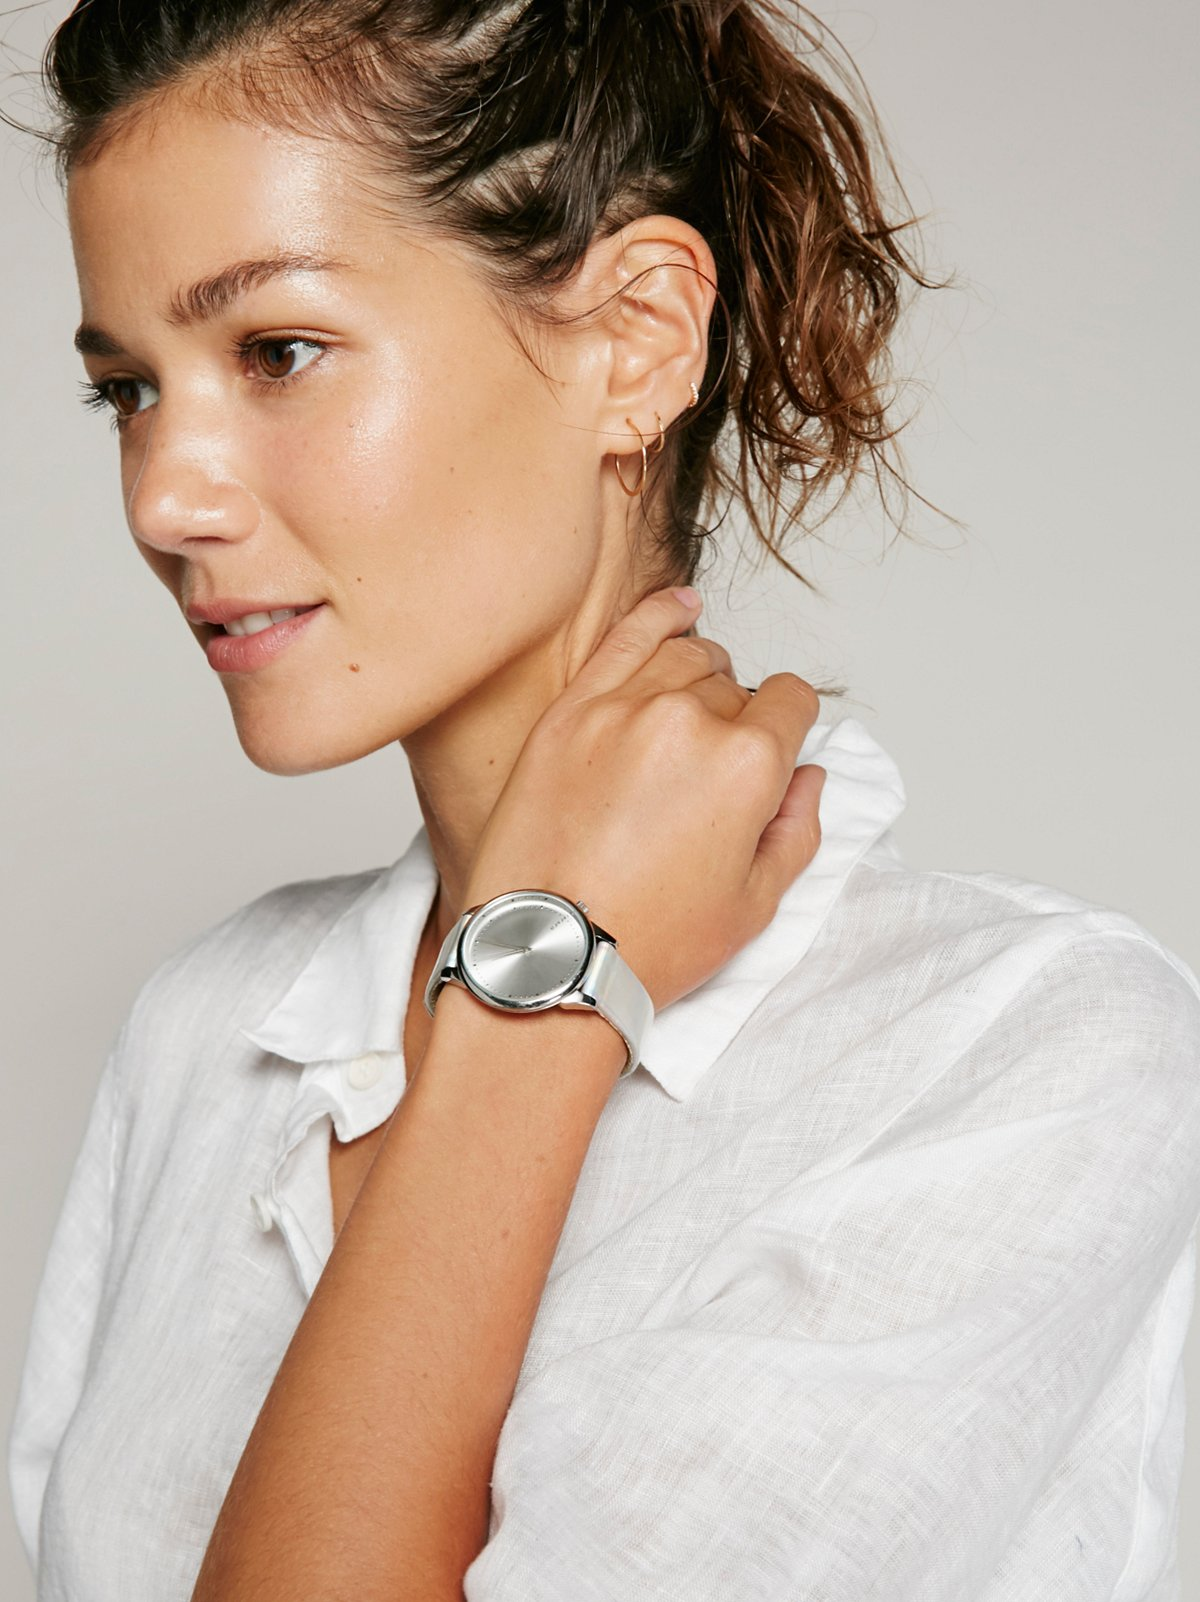 Estelle Iridescent Leather Watch